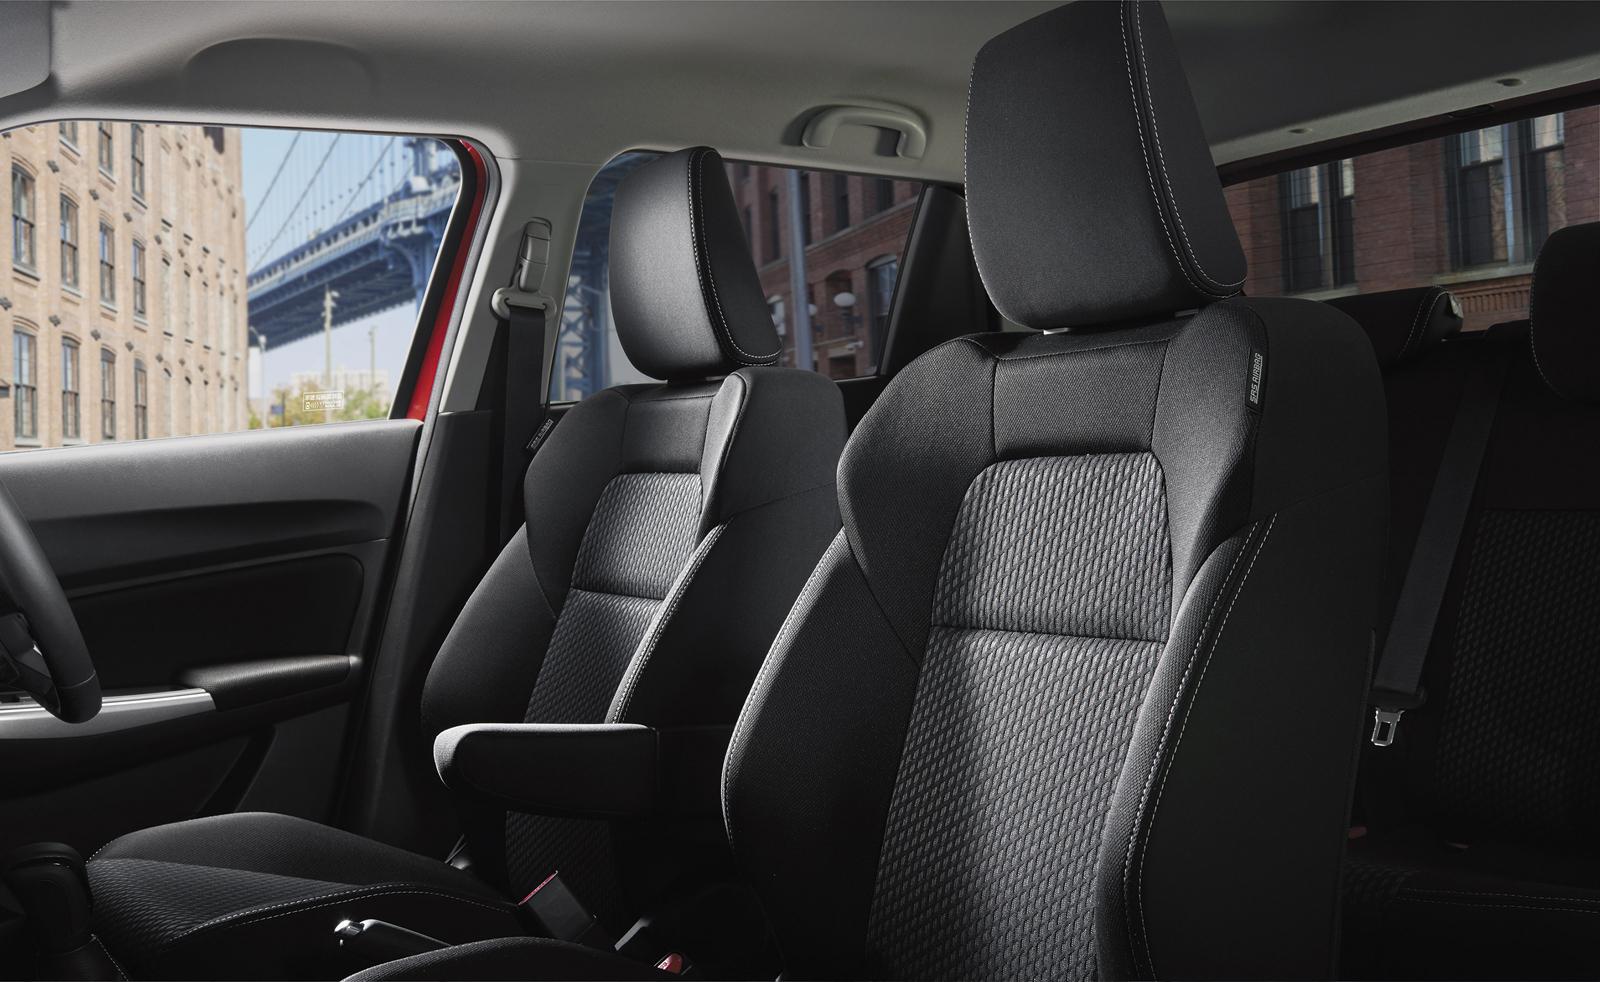 2017 (Maruti) Suzuki Swift Design Review | Motoroids